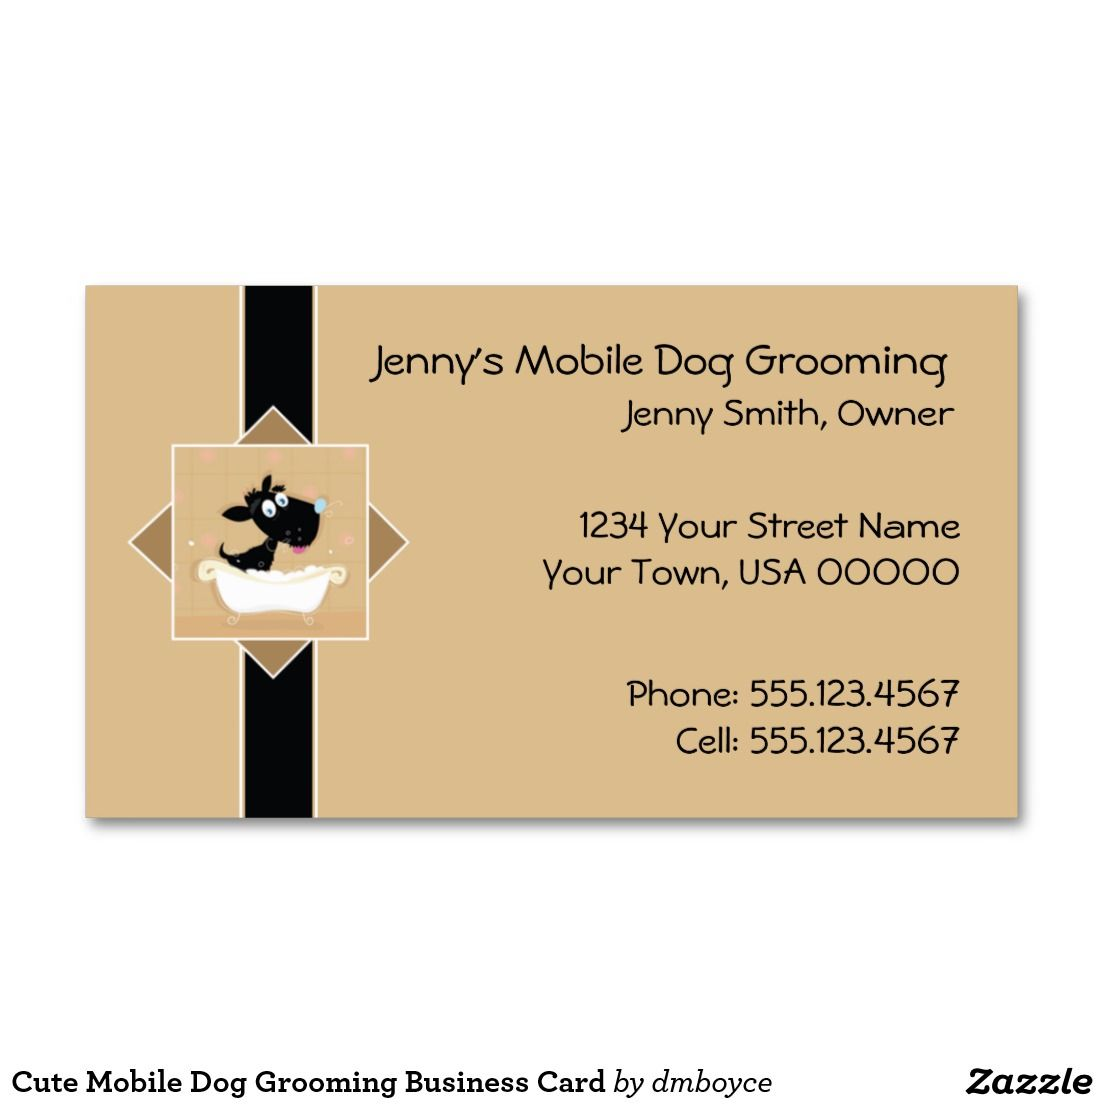 Cute Mobile Dog Grooming Business Card | biz ideas | Pinterest ...